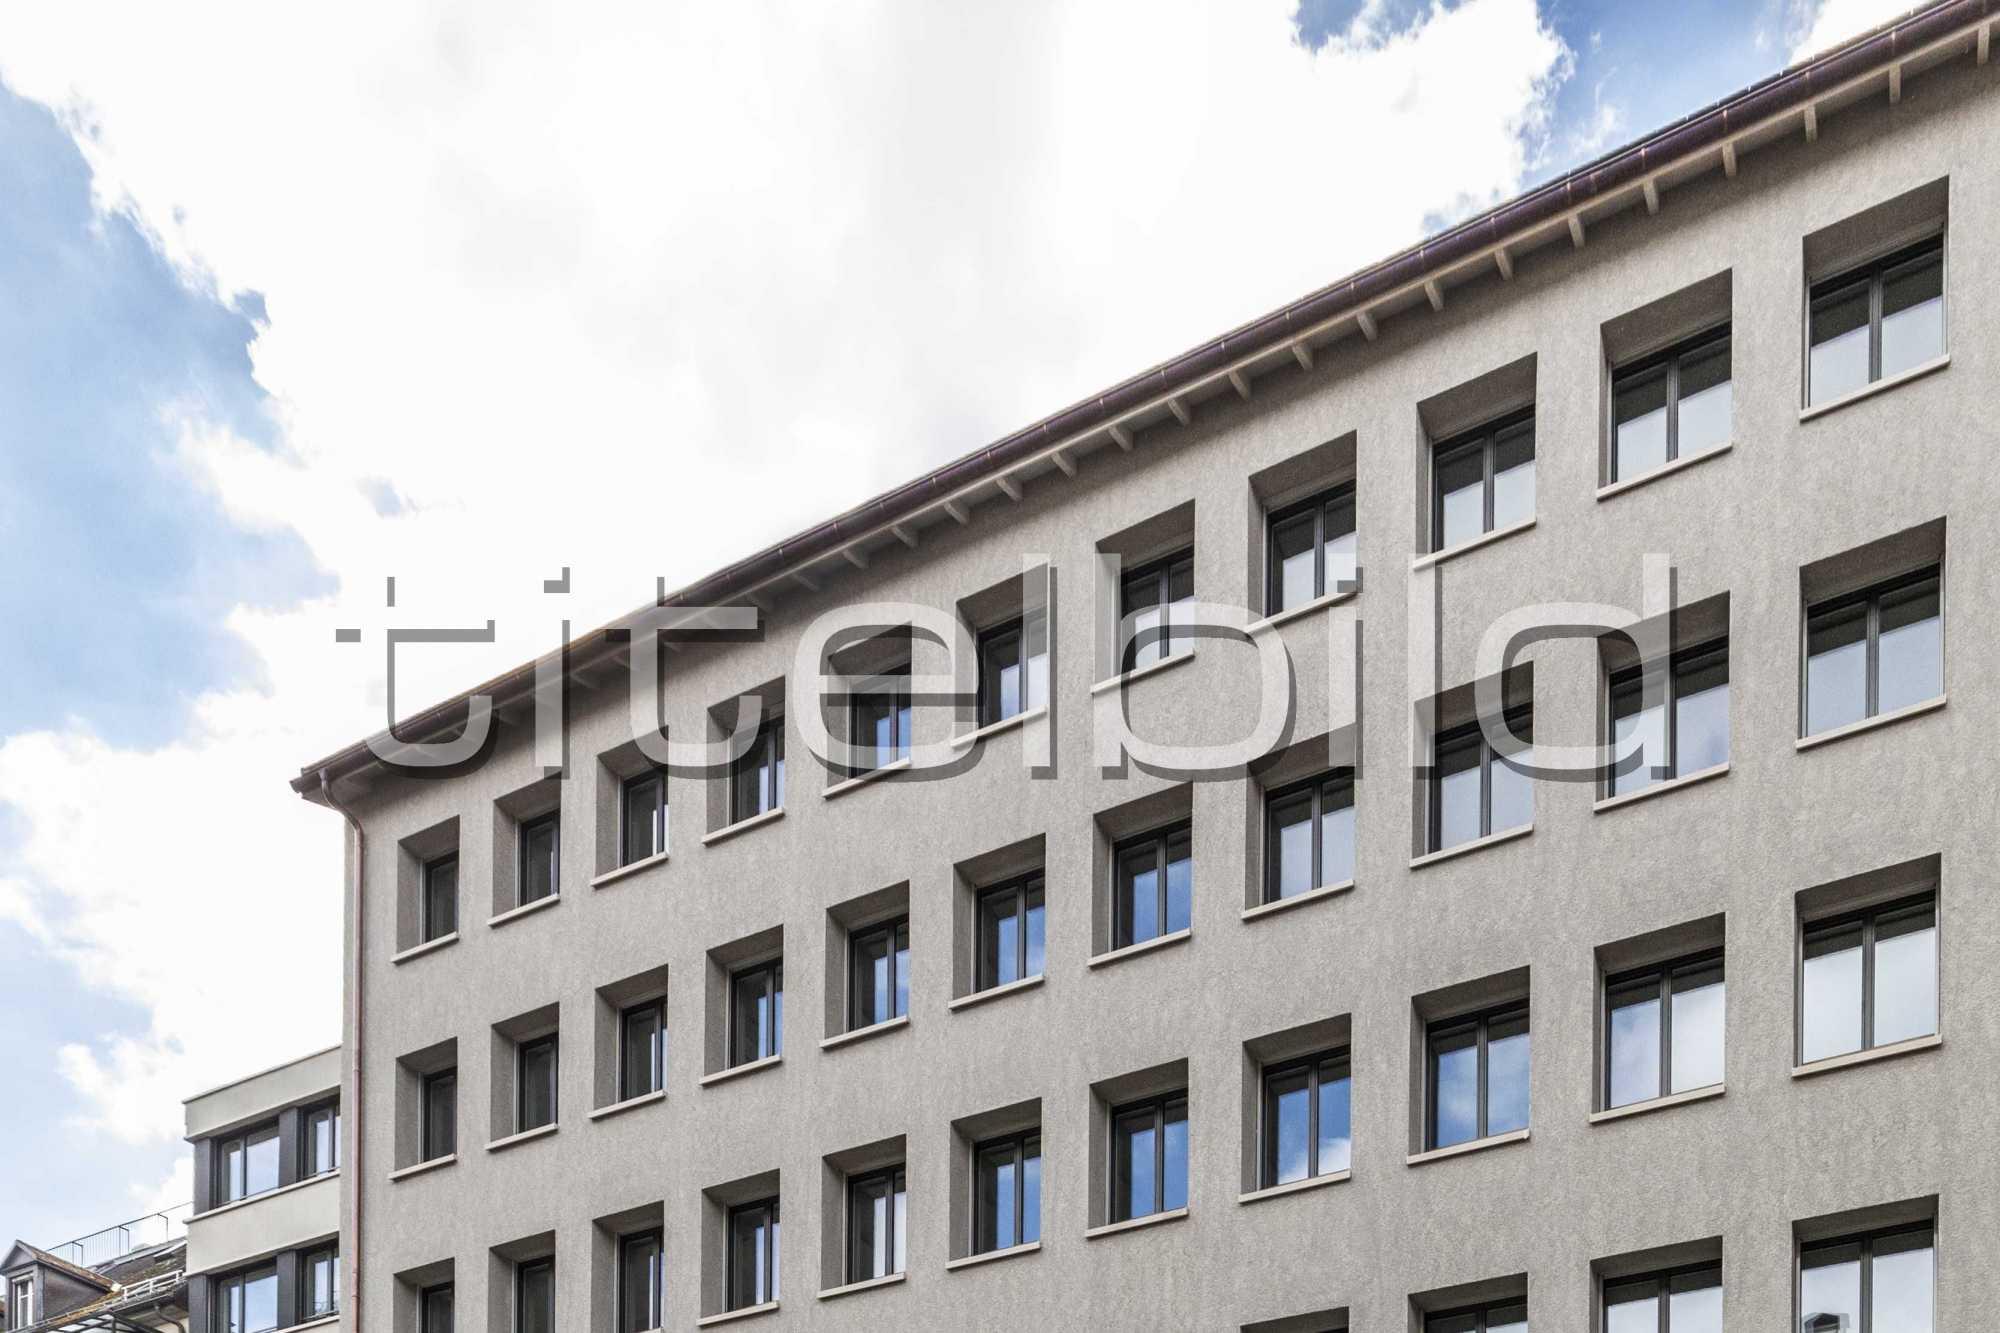 Projektbild-Nr. 2: Umbau Bürogebäude